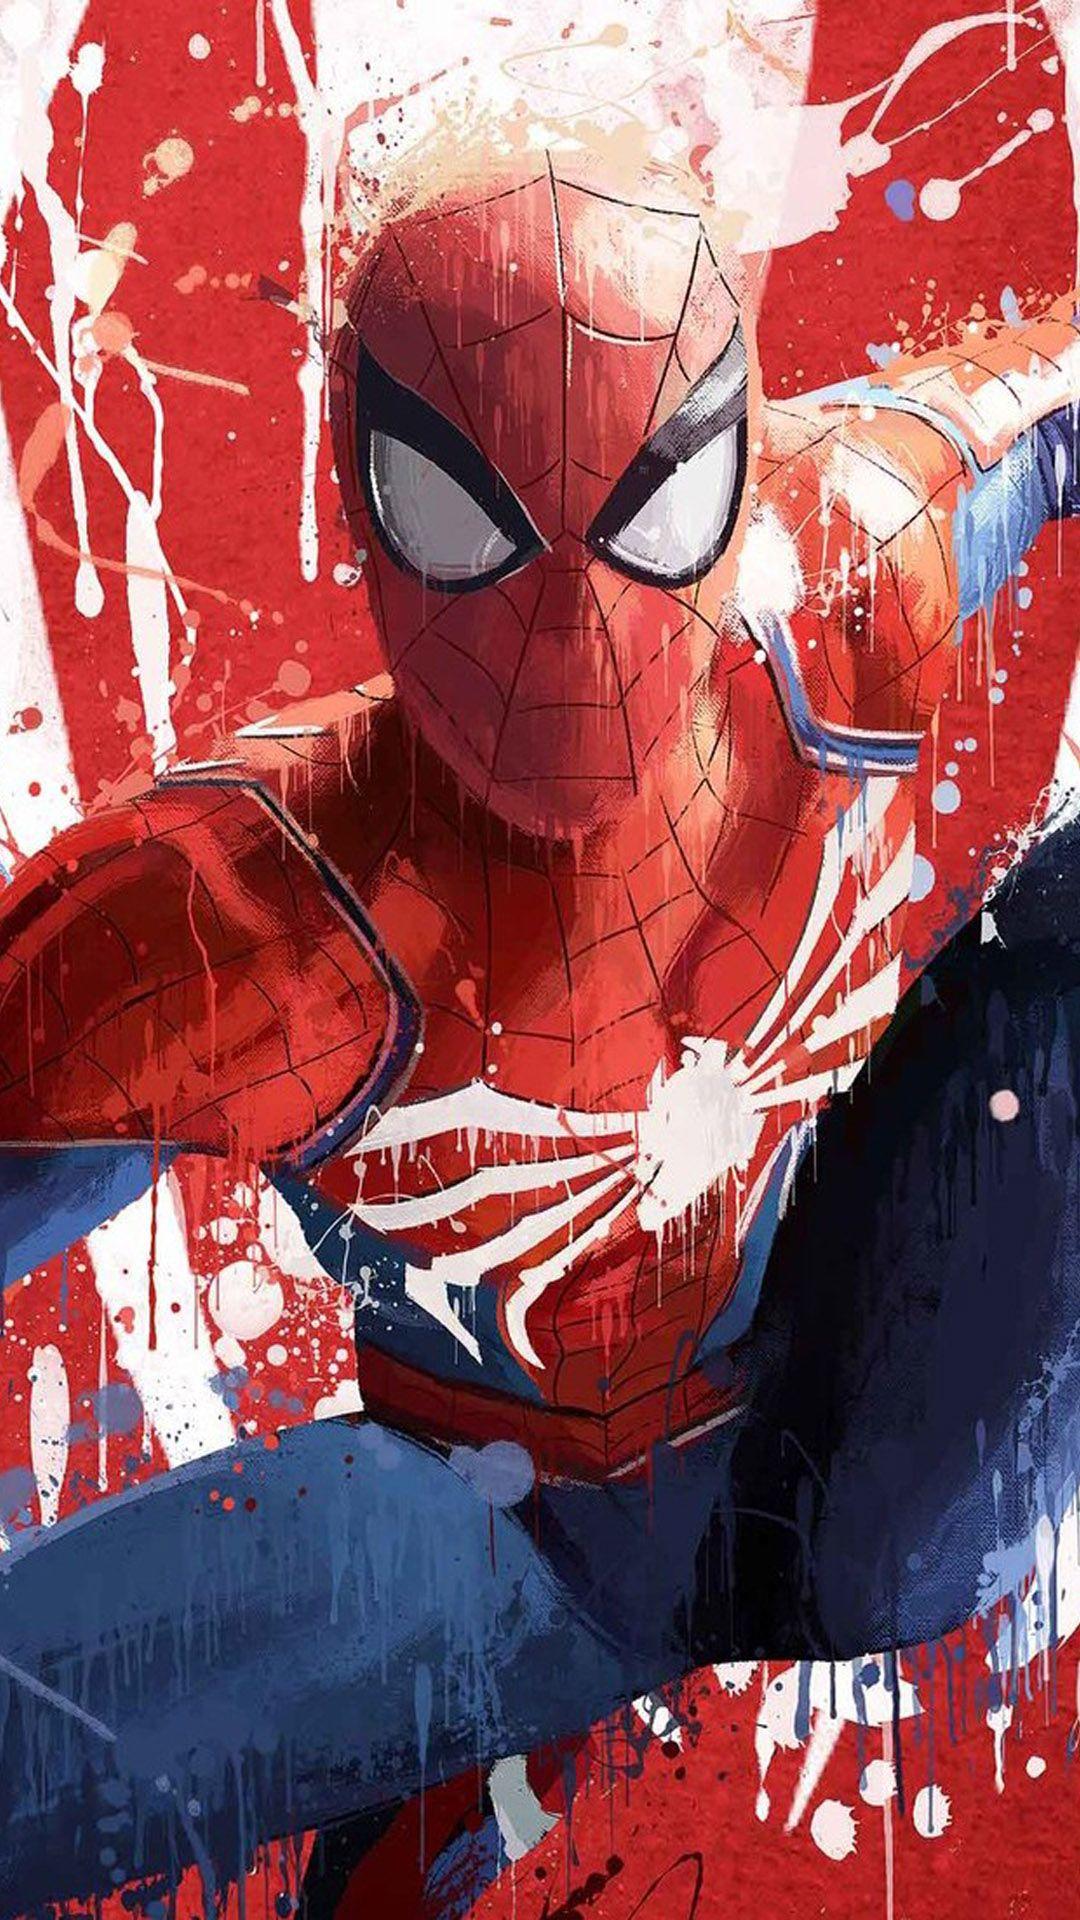 Spider Man Fan Artwork Hd Mobile Wallpaper Spiderman Artwork Spiderman Art Marvel Comics Wallpaper